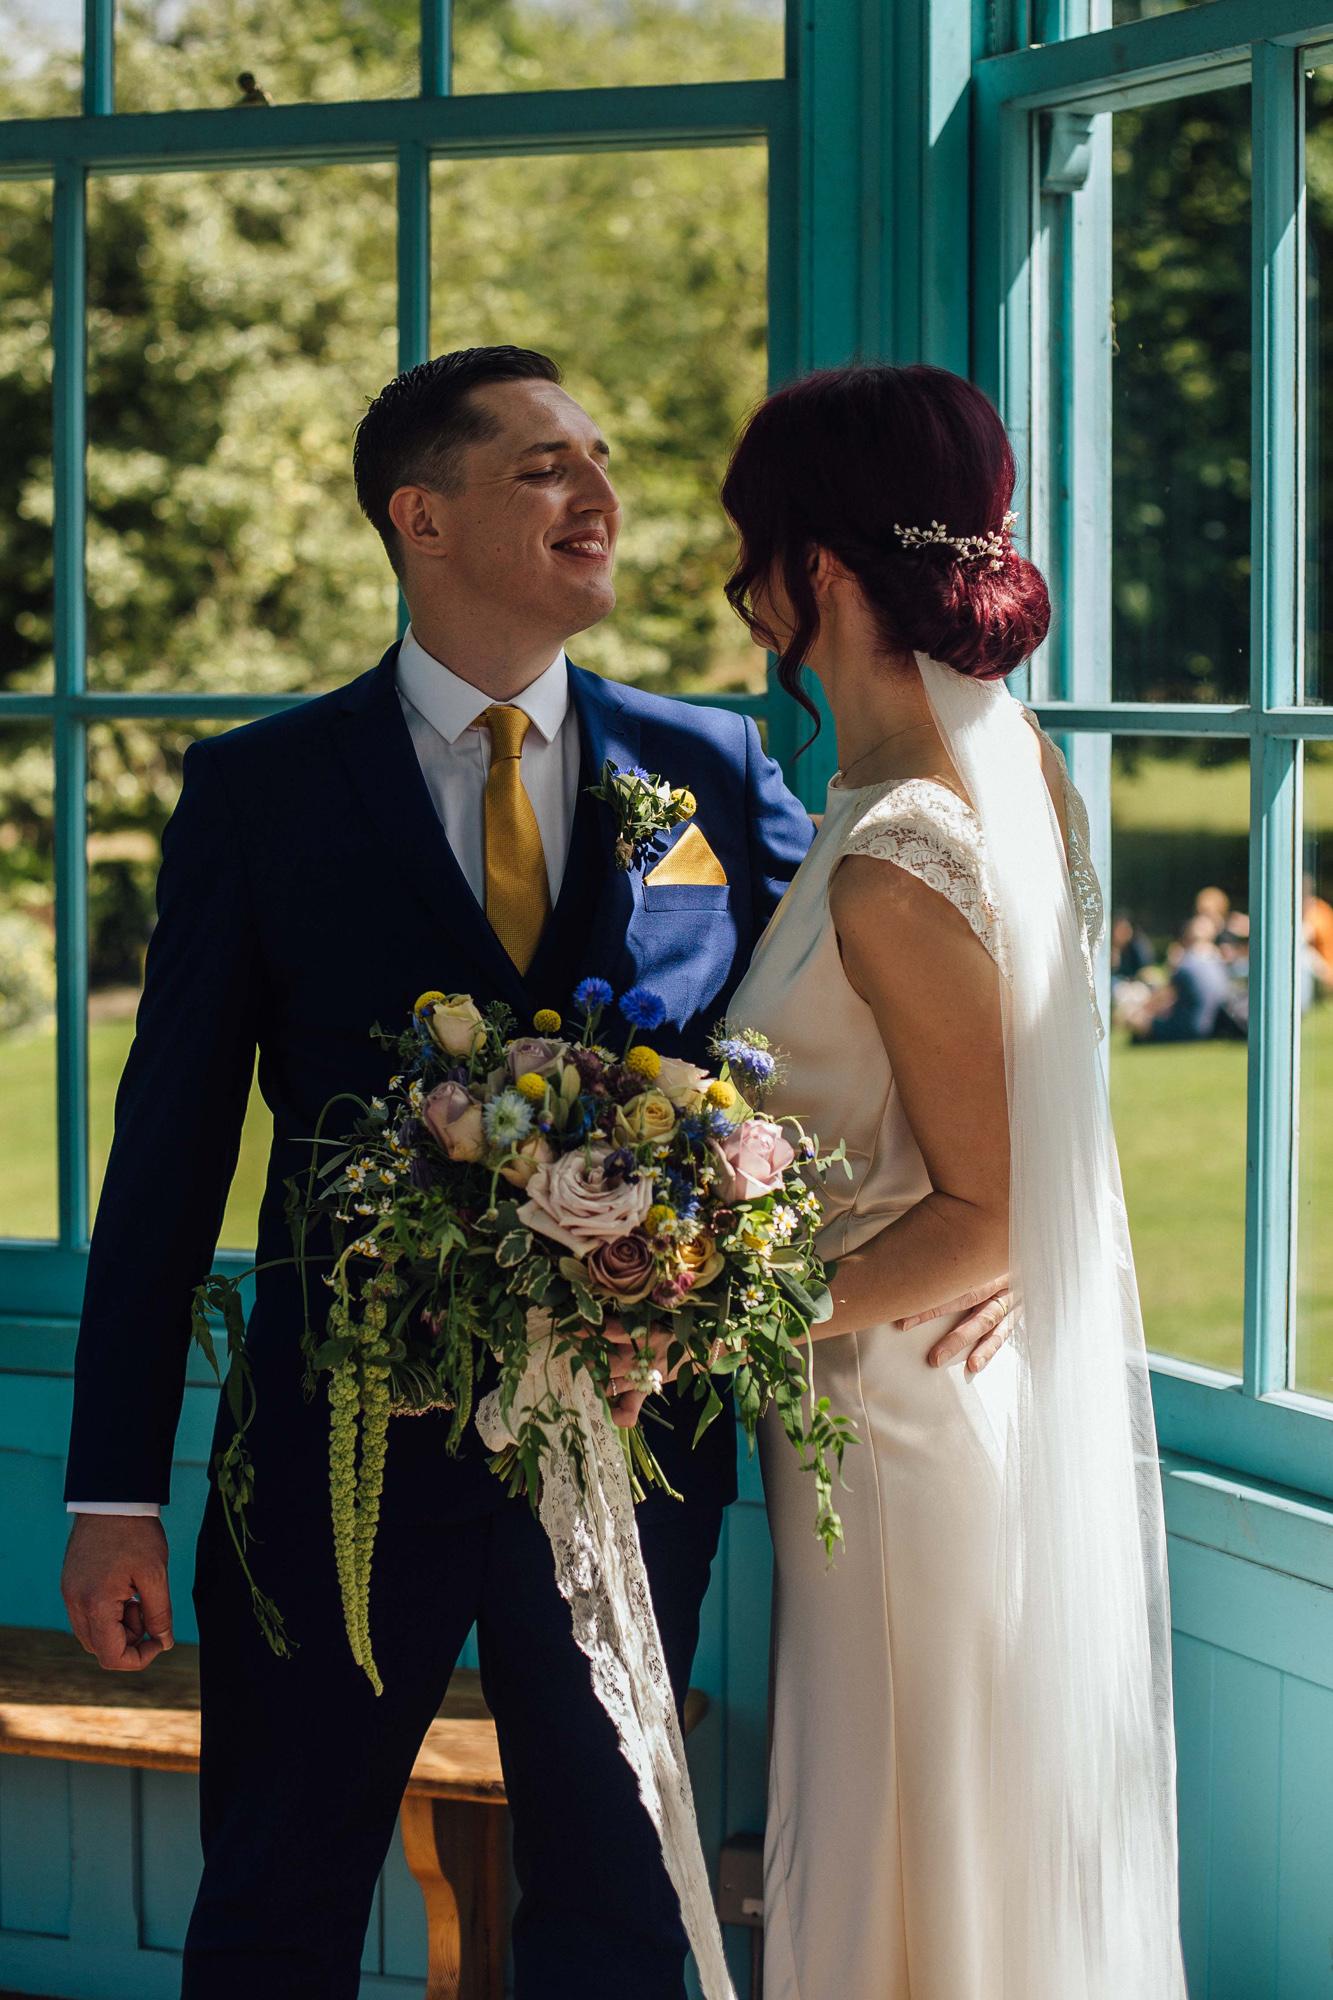 Sarah-Honeysuckle-Bias-Cut-Silk-Vintage-Inspired-Wedding-Gown-Sheffield-Wedding-Kate-Beaumont-26.jpg